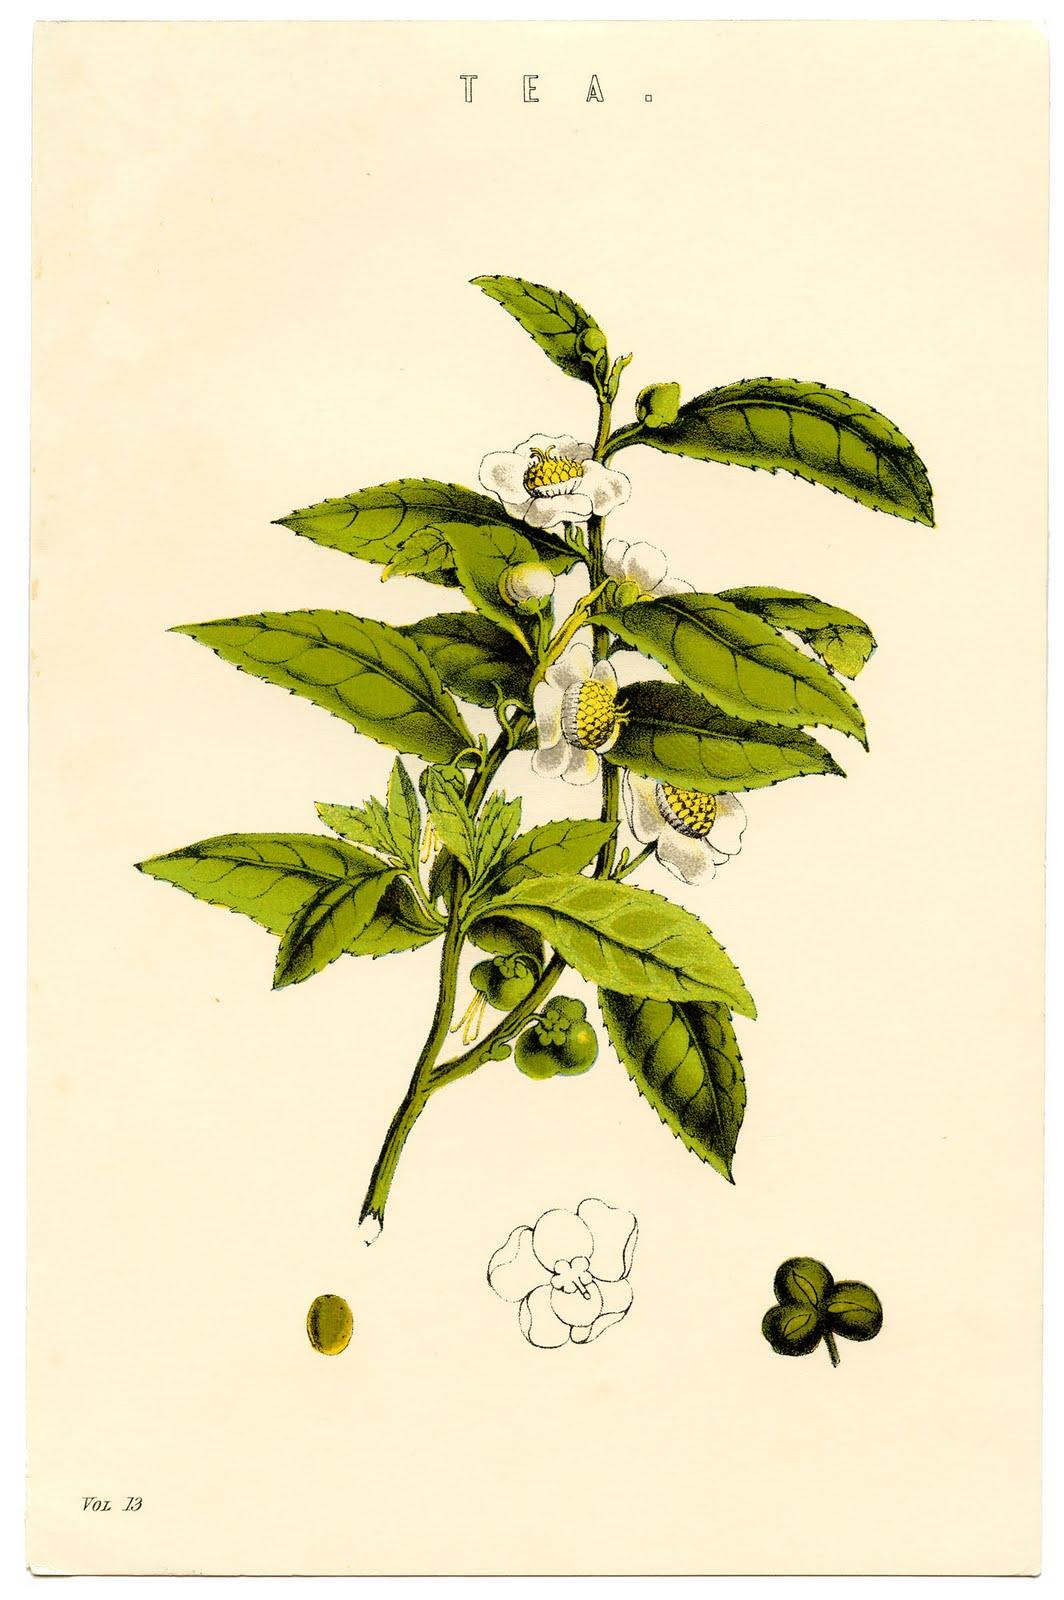 the tea plant #AmericasTea, Bigelow Tea